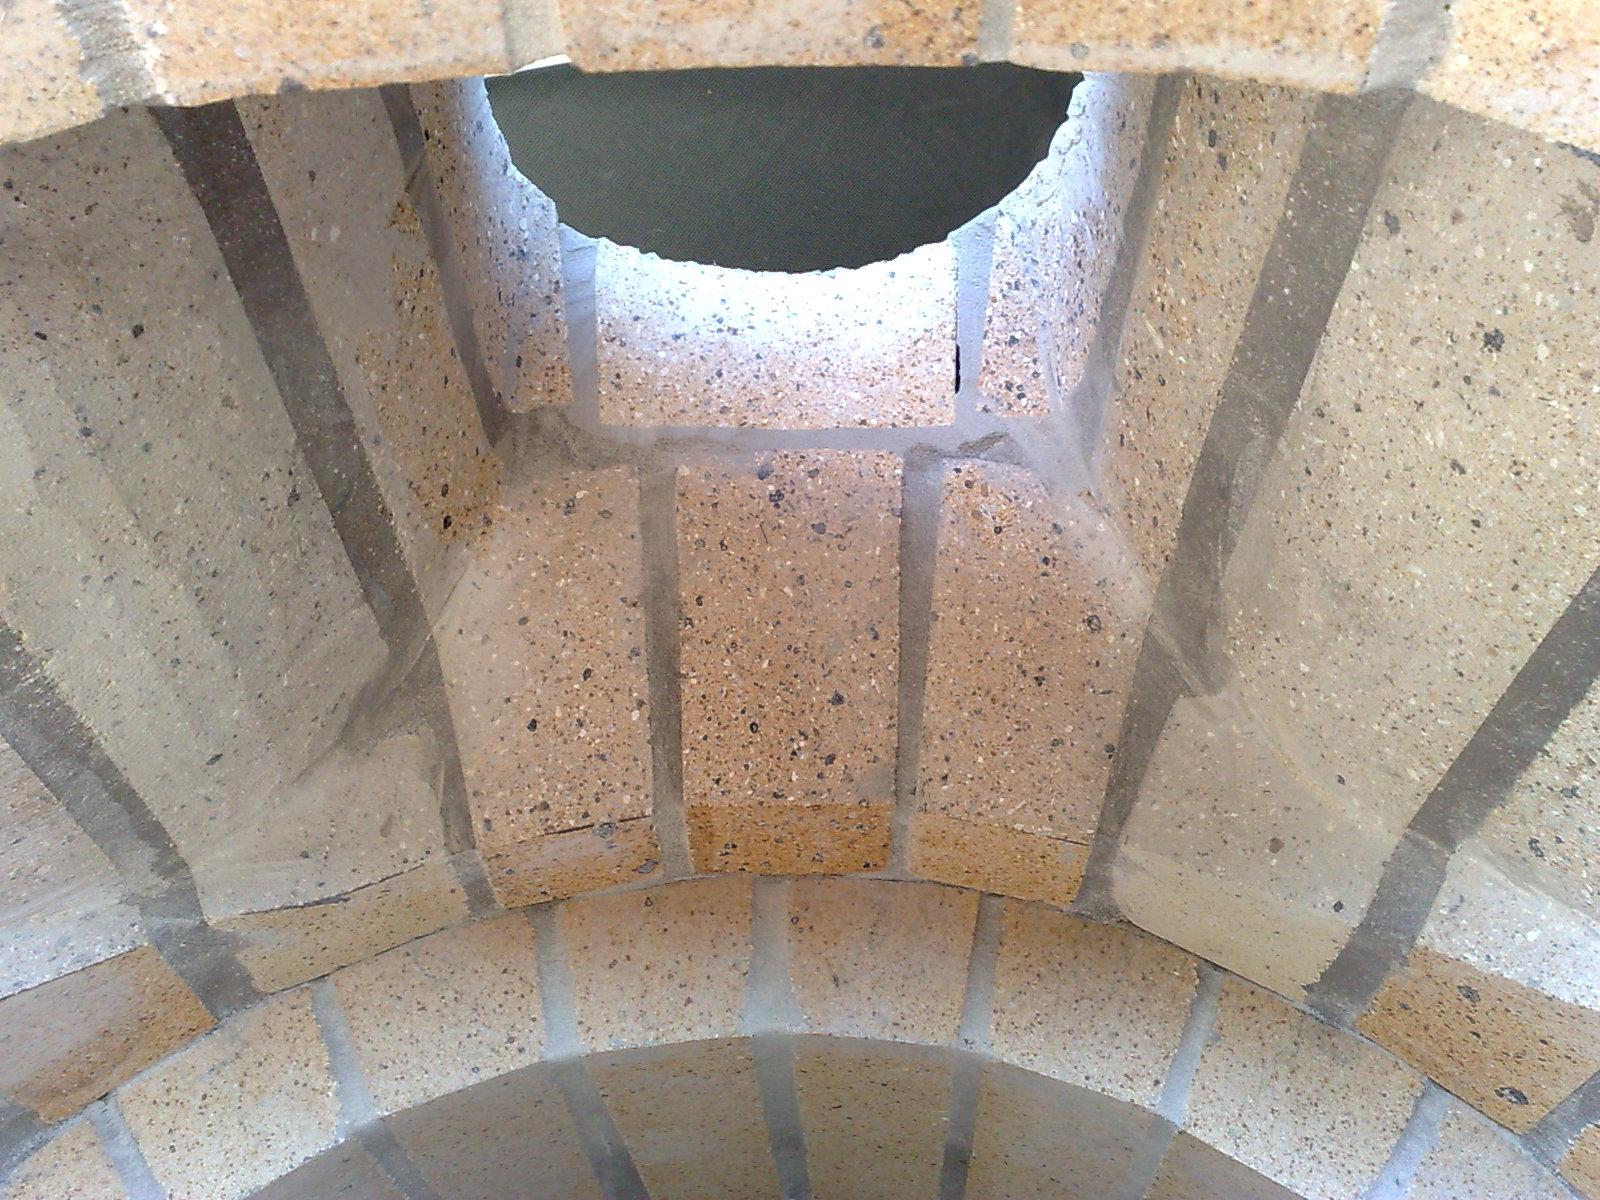 Shaped chimney bricks from below